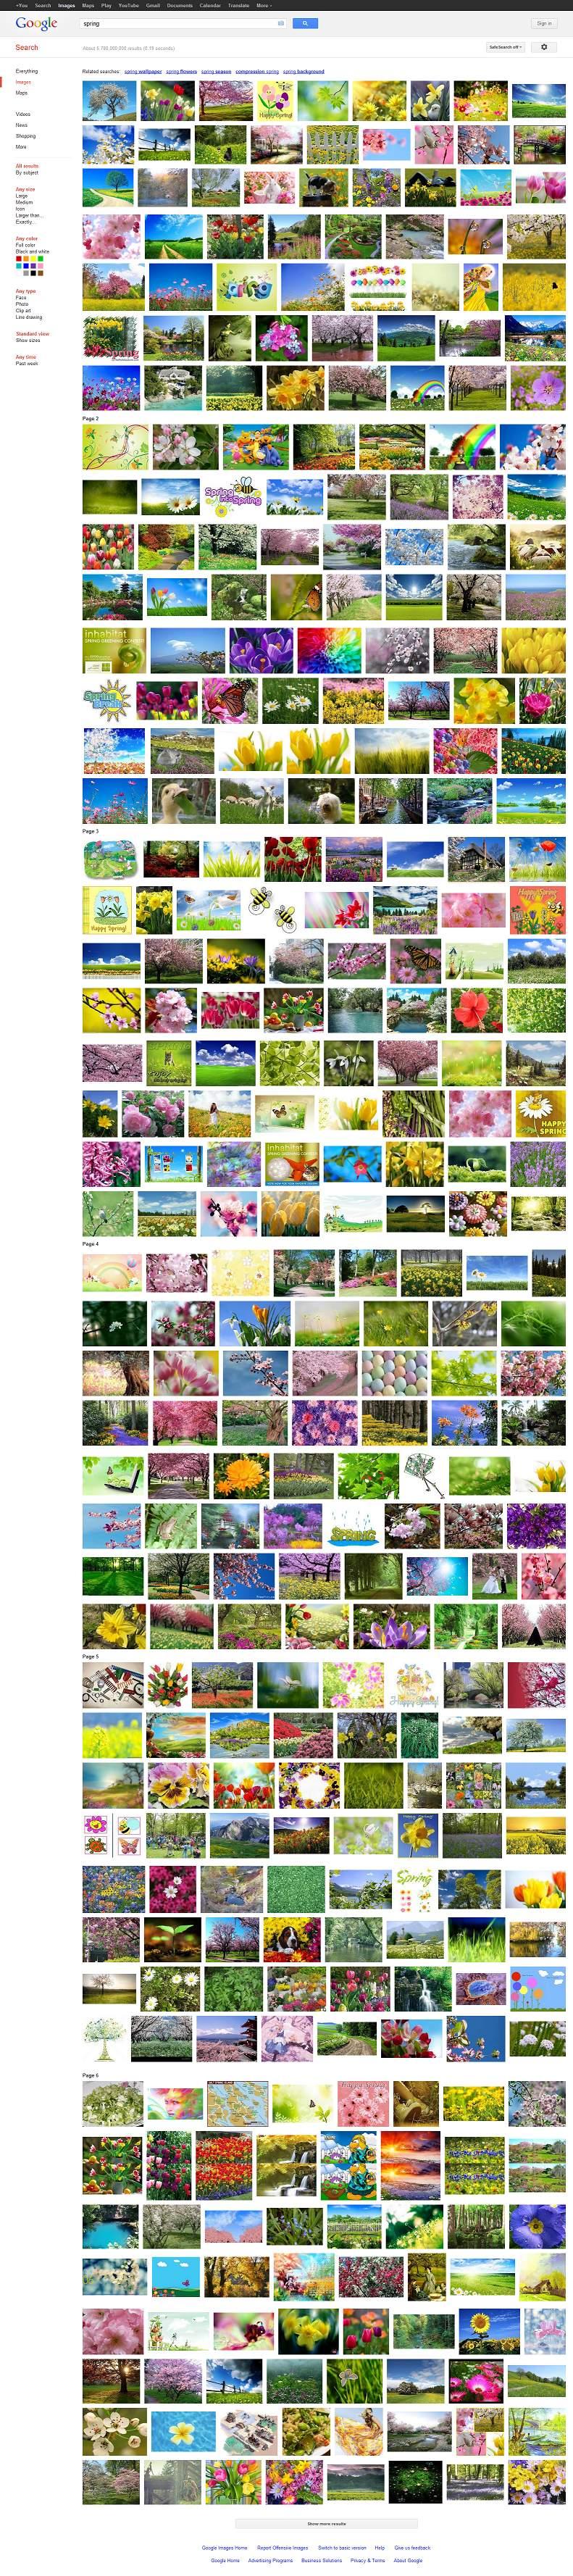 google-spring-en-2012-50